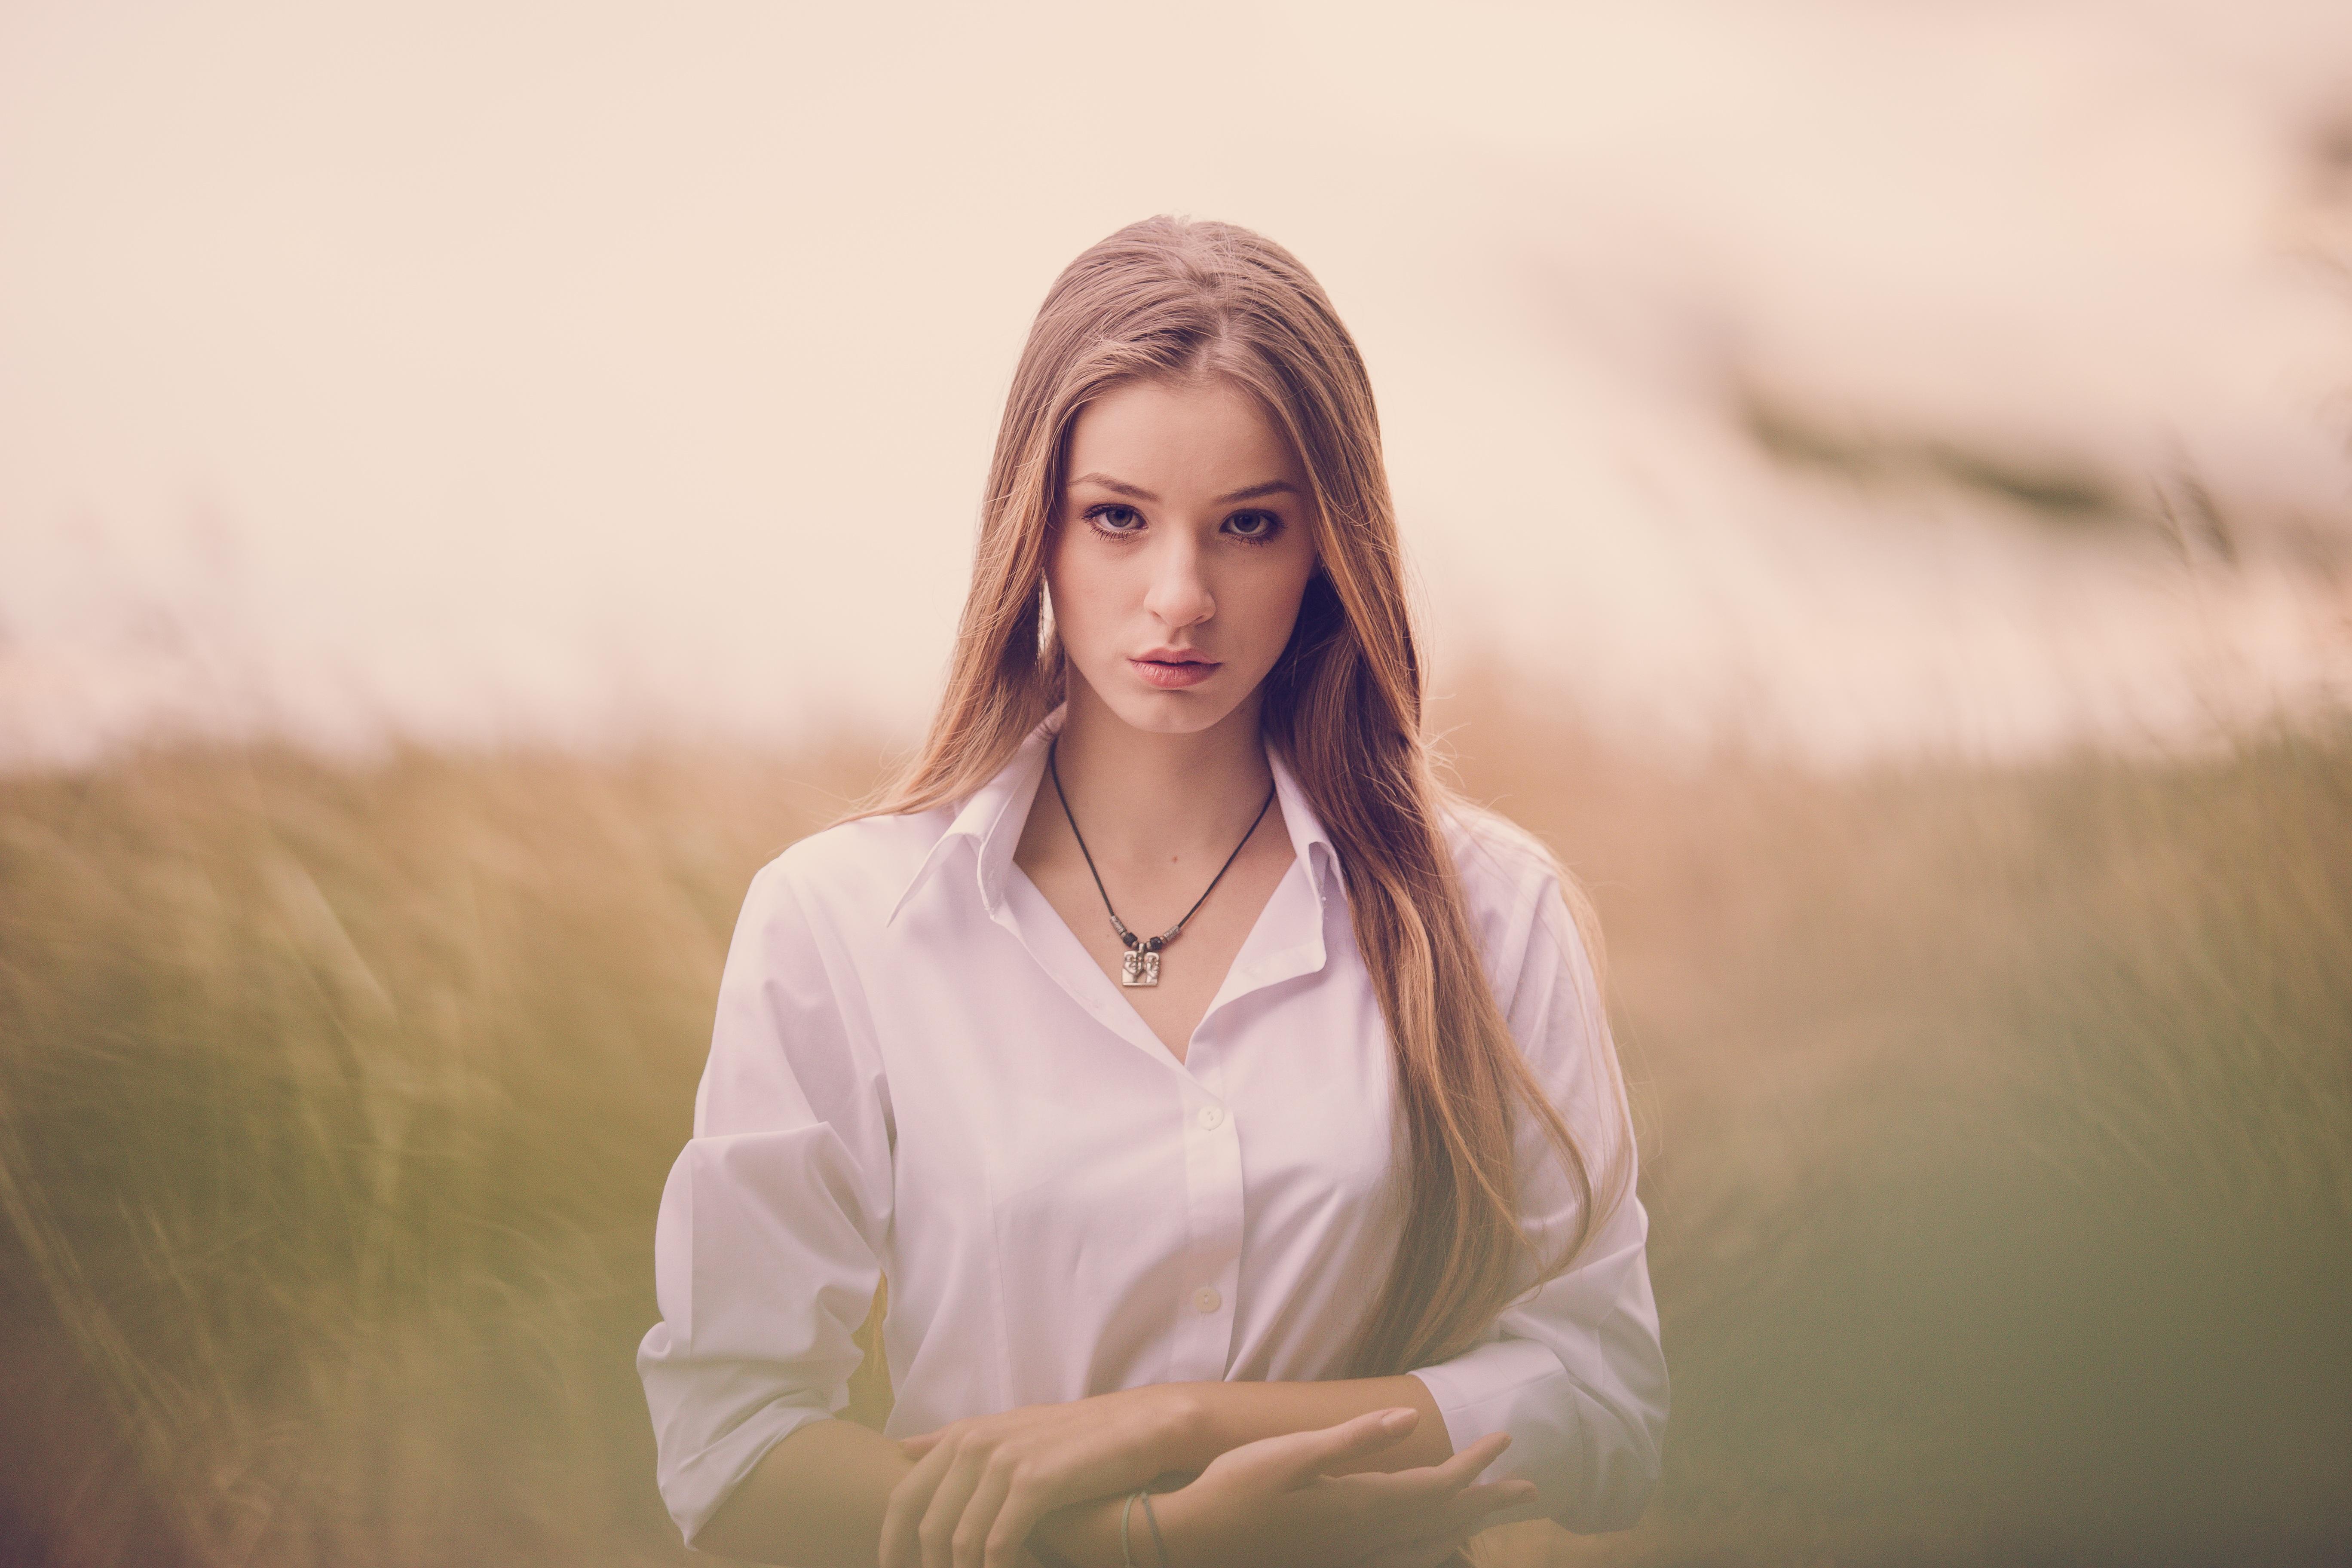 xxx daughter seductive model